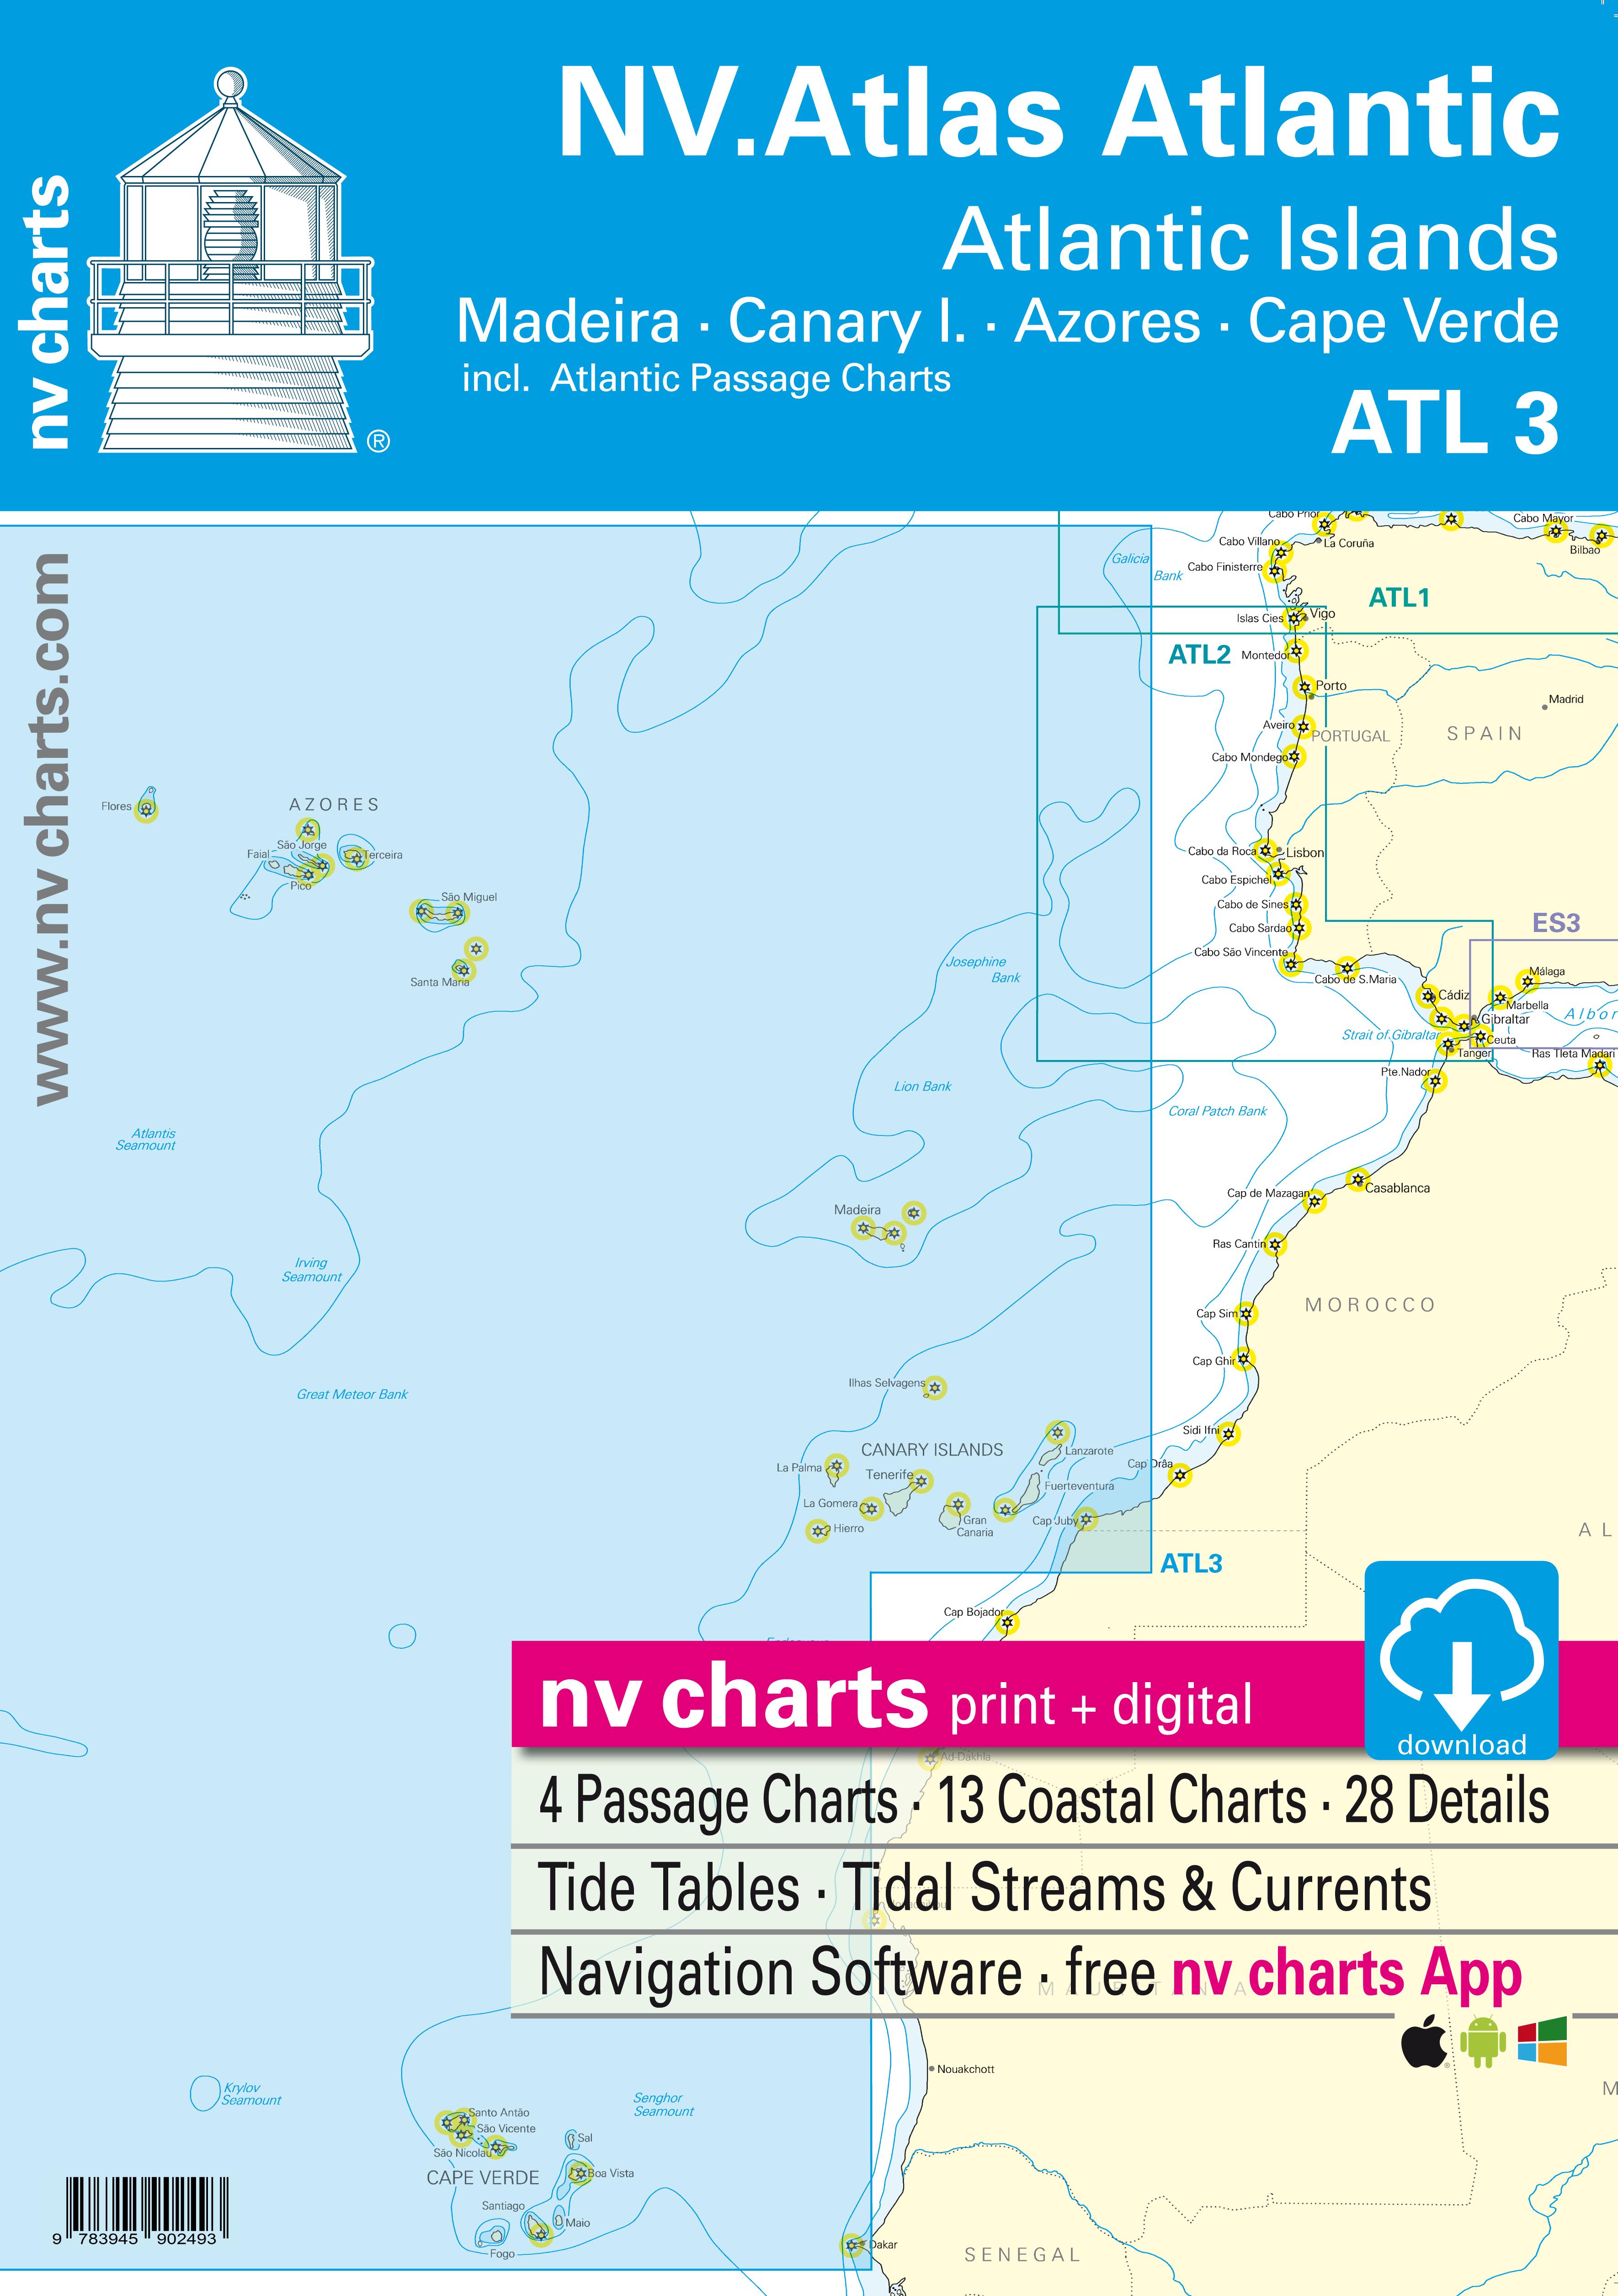 NV Atlas ATL3: Madeira, Canary Isles, Azores & Cape Verdes